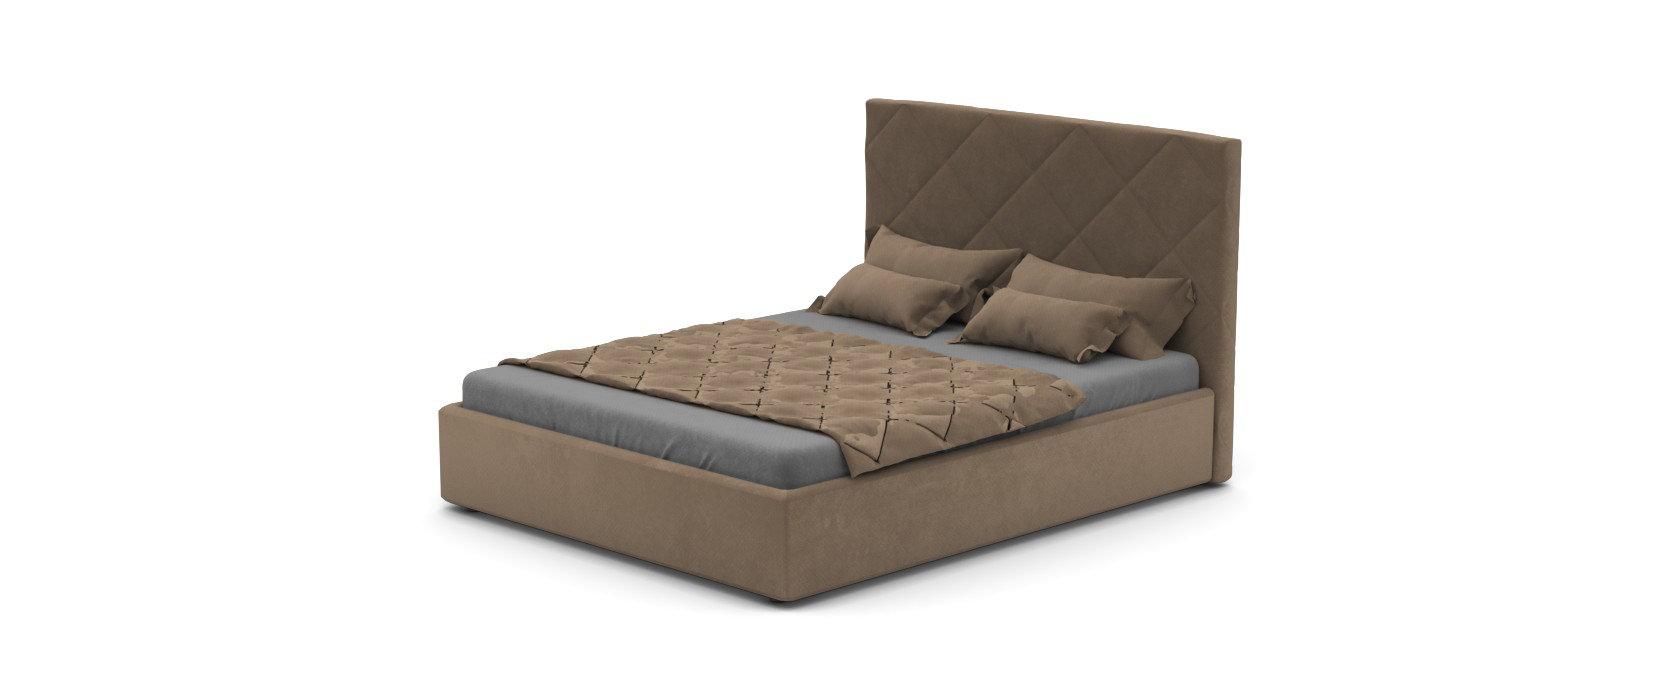 Кровать Messina - Pufetto